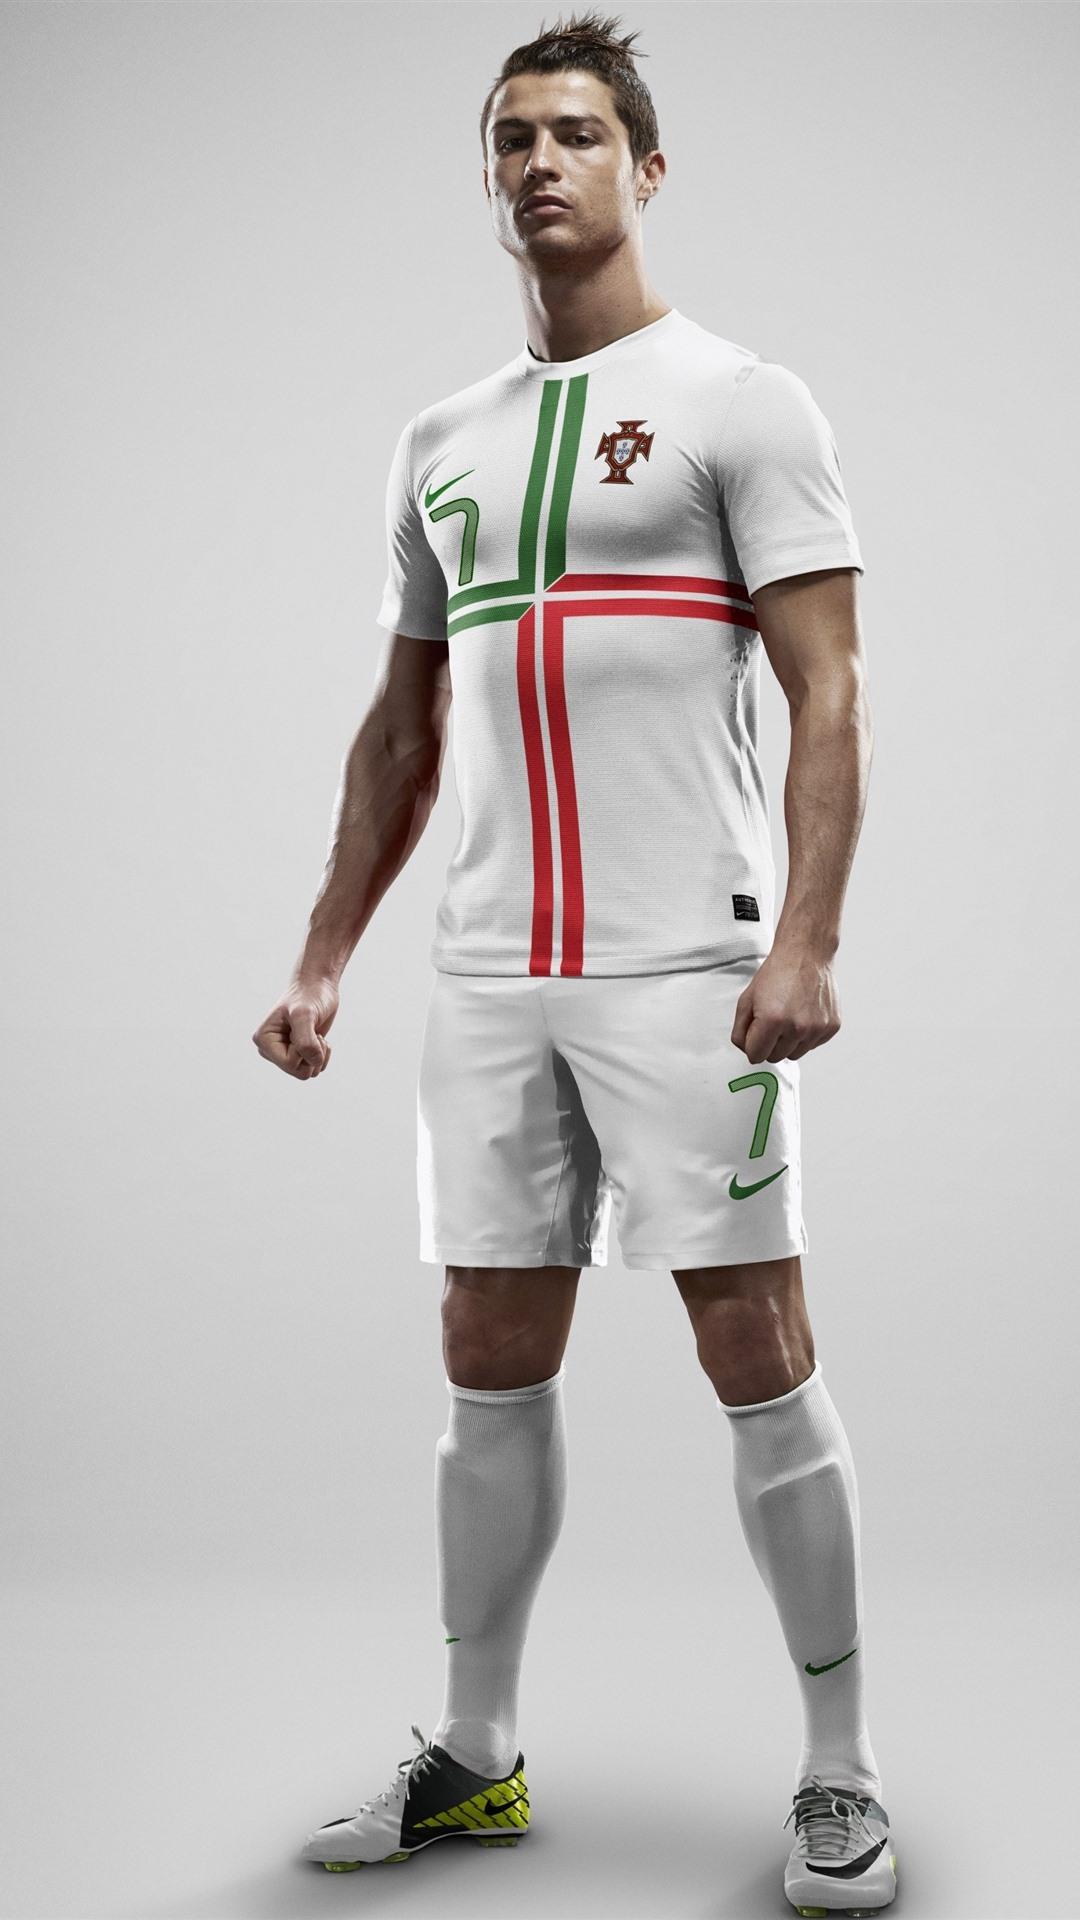 Fondos De Pantalla Cristiano Ronaldo Estrella Del Futbol